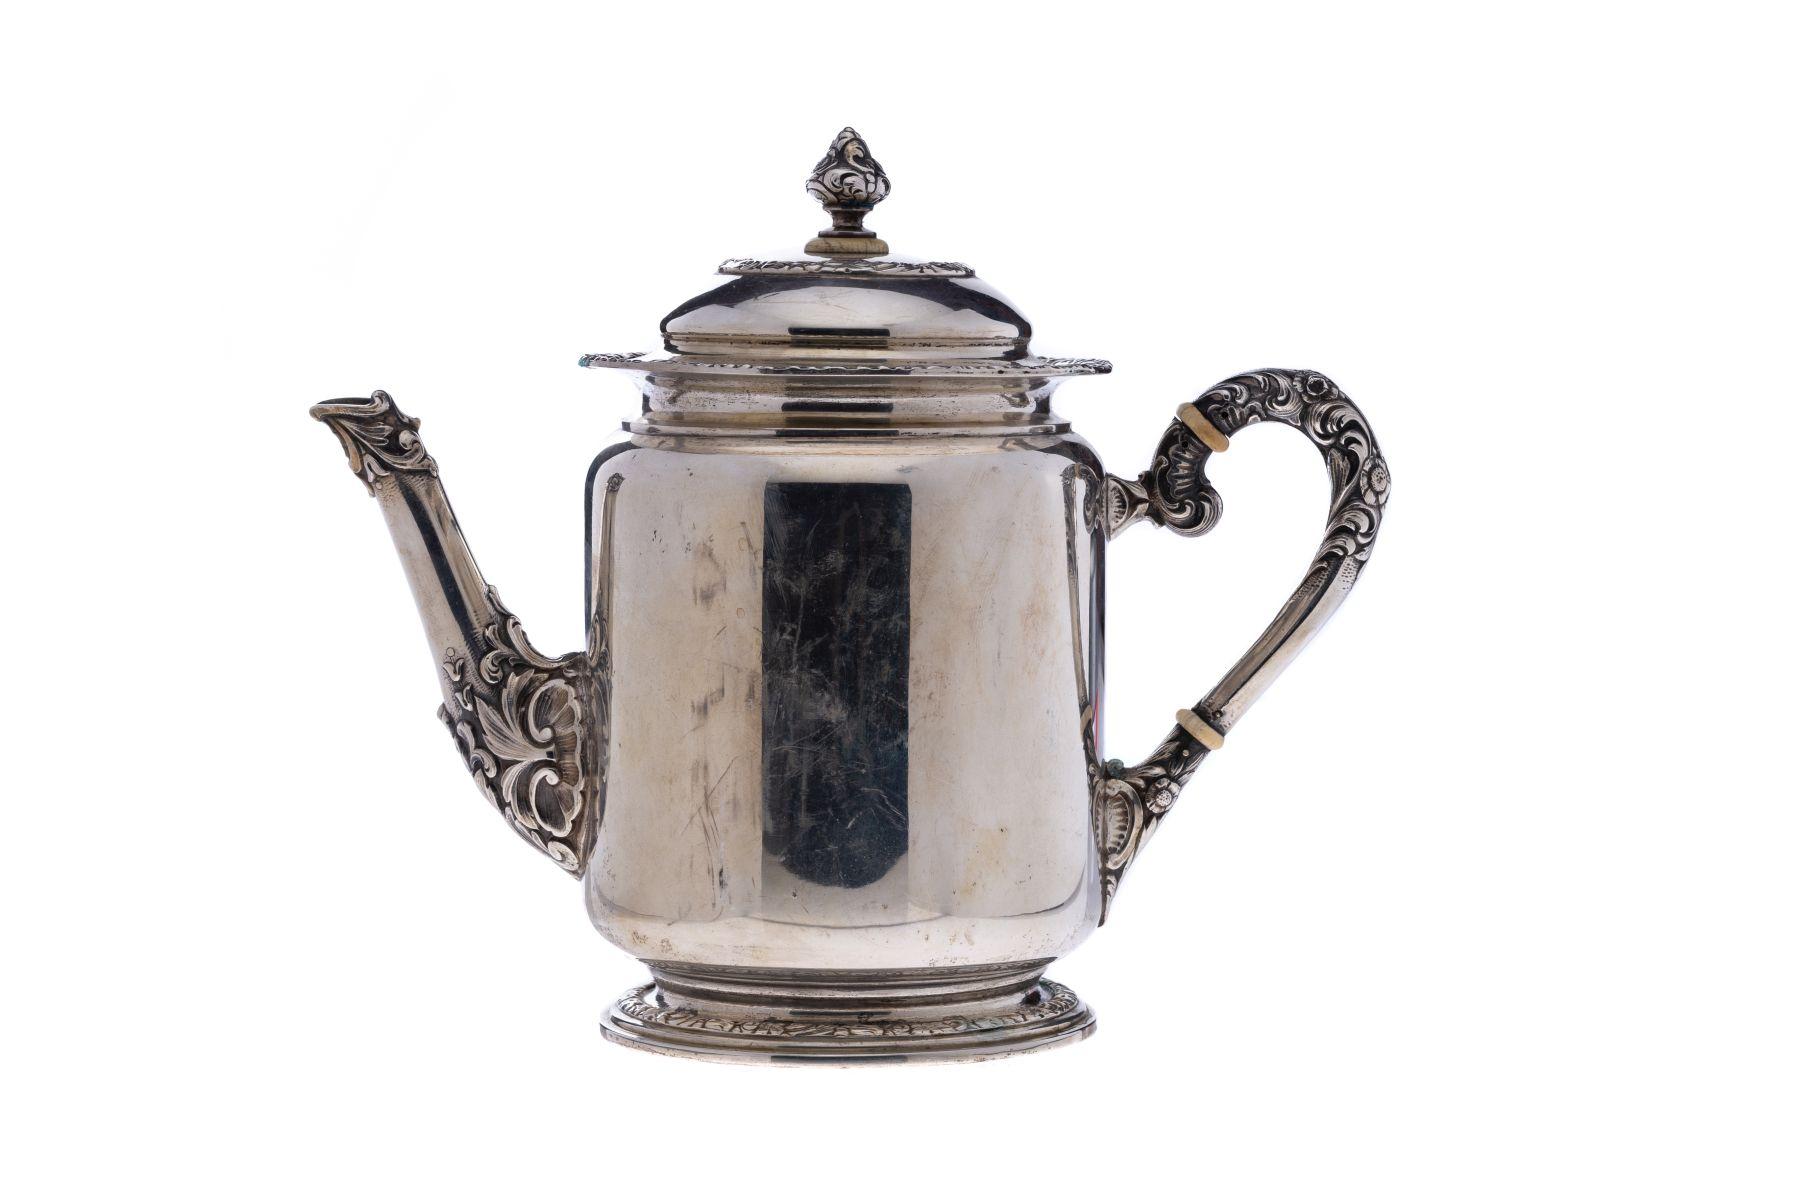 #4 Coffee pot | Kaffekanne Image